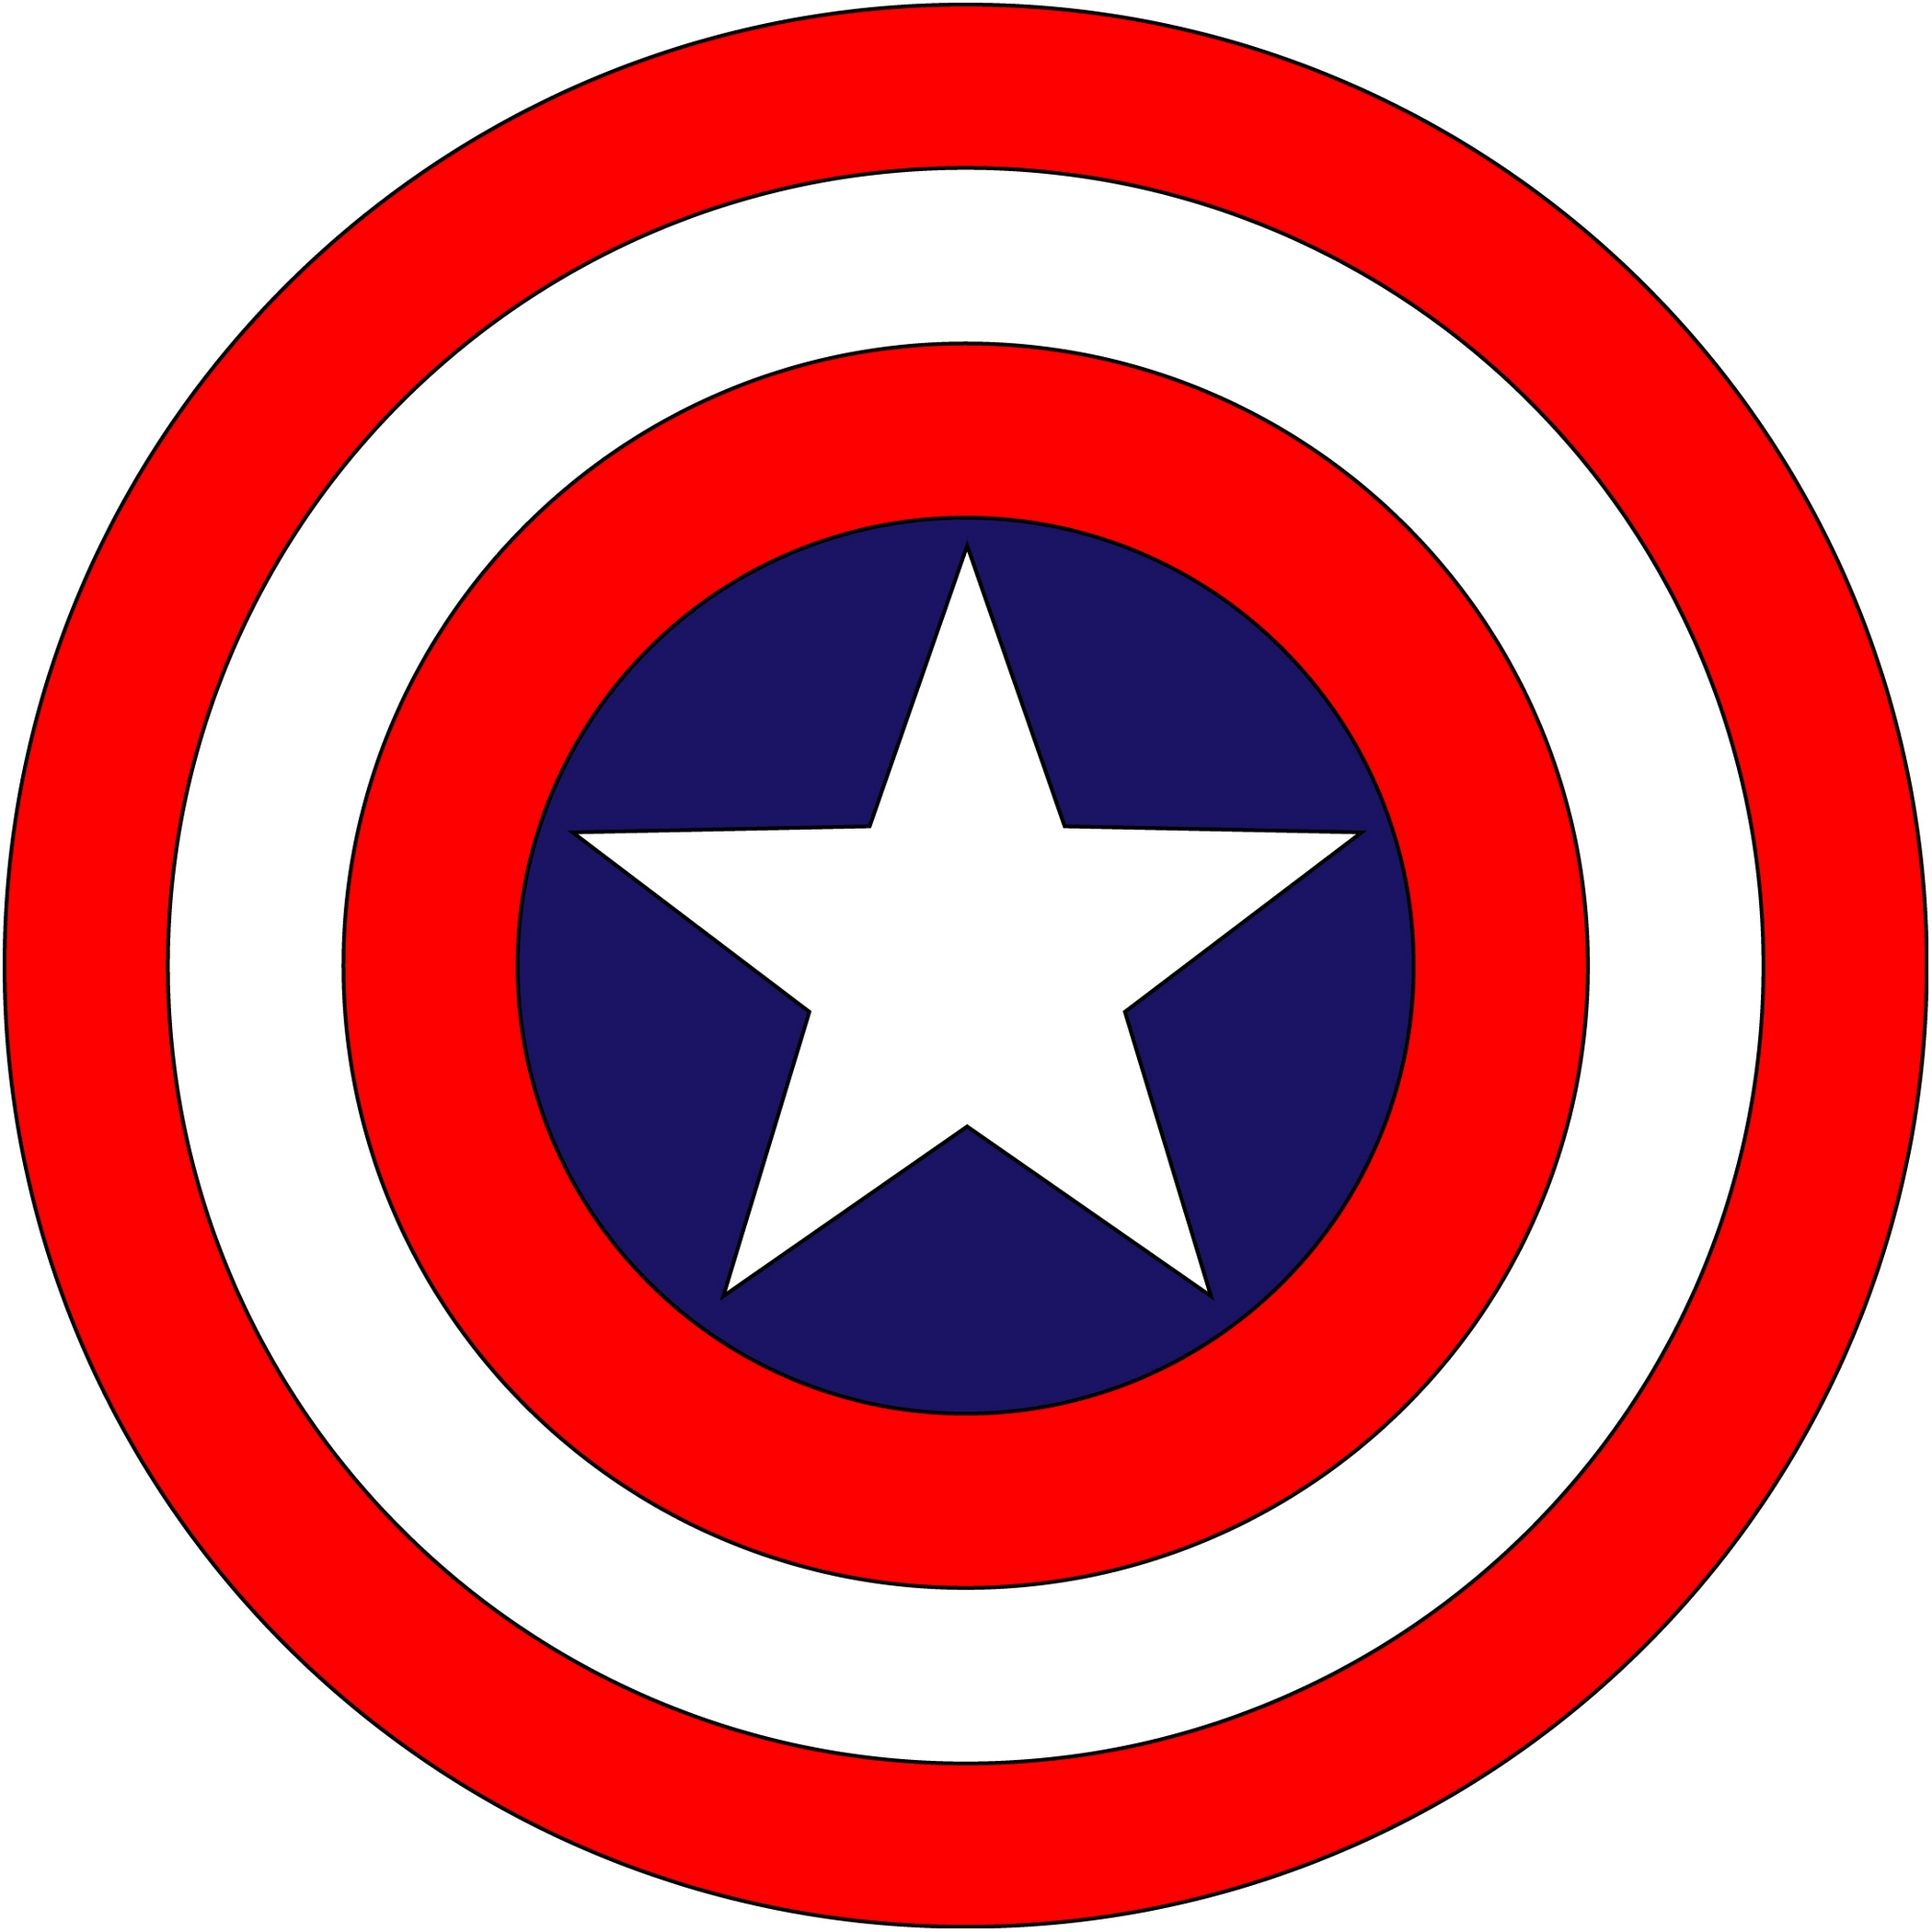 Logos superheroes clipart banner stock Free Superhero Badge Cliparts, Download Free Clip Art, Free ... banner stock